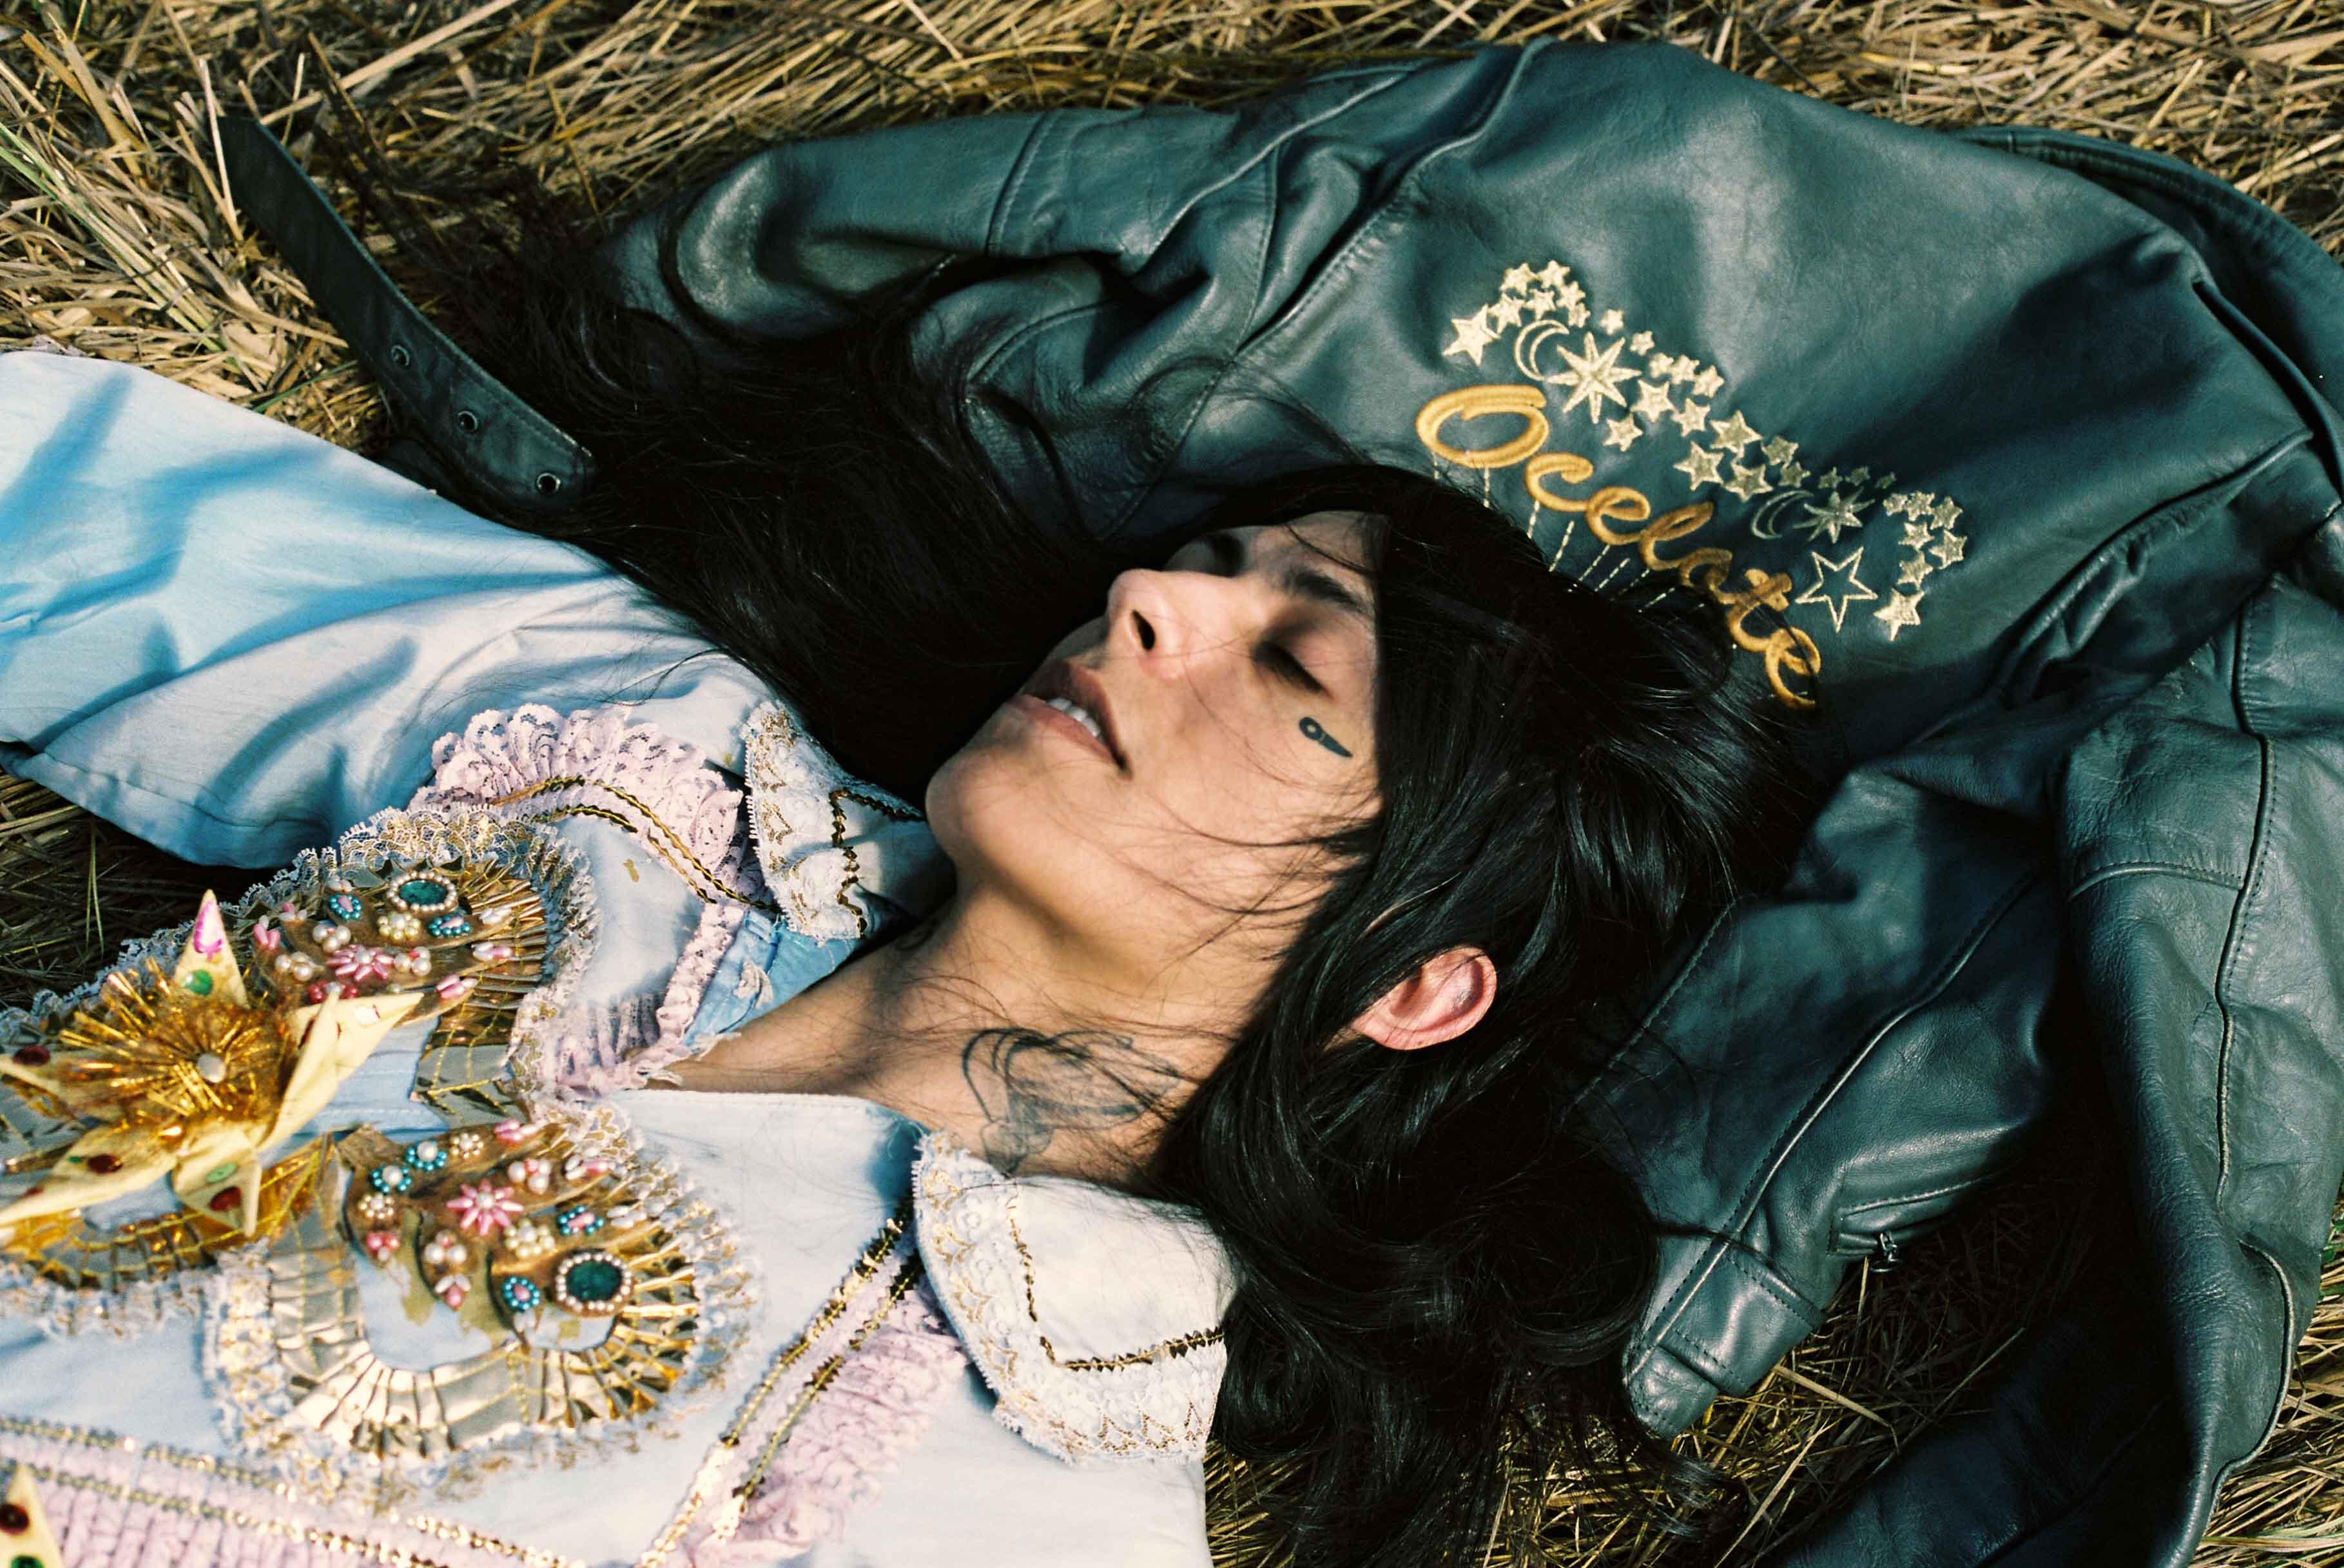 Elysia Crampton par Boychild